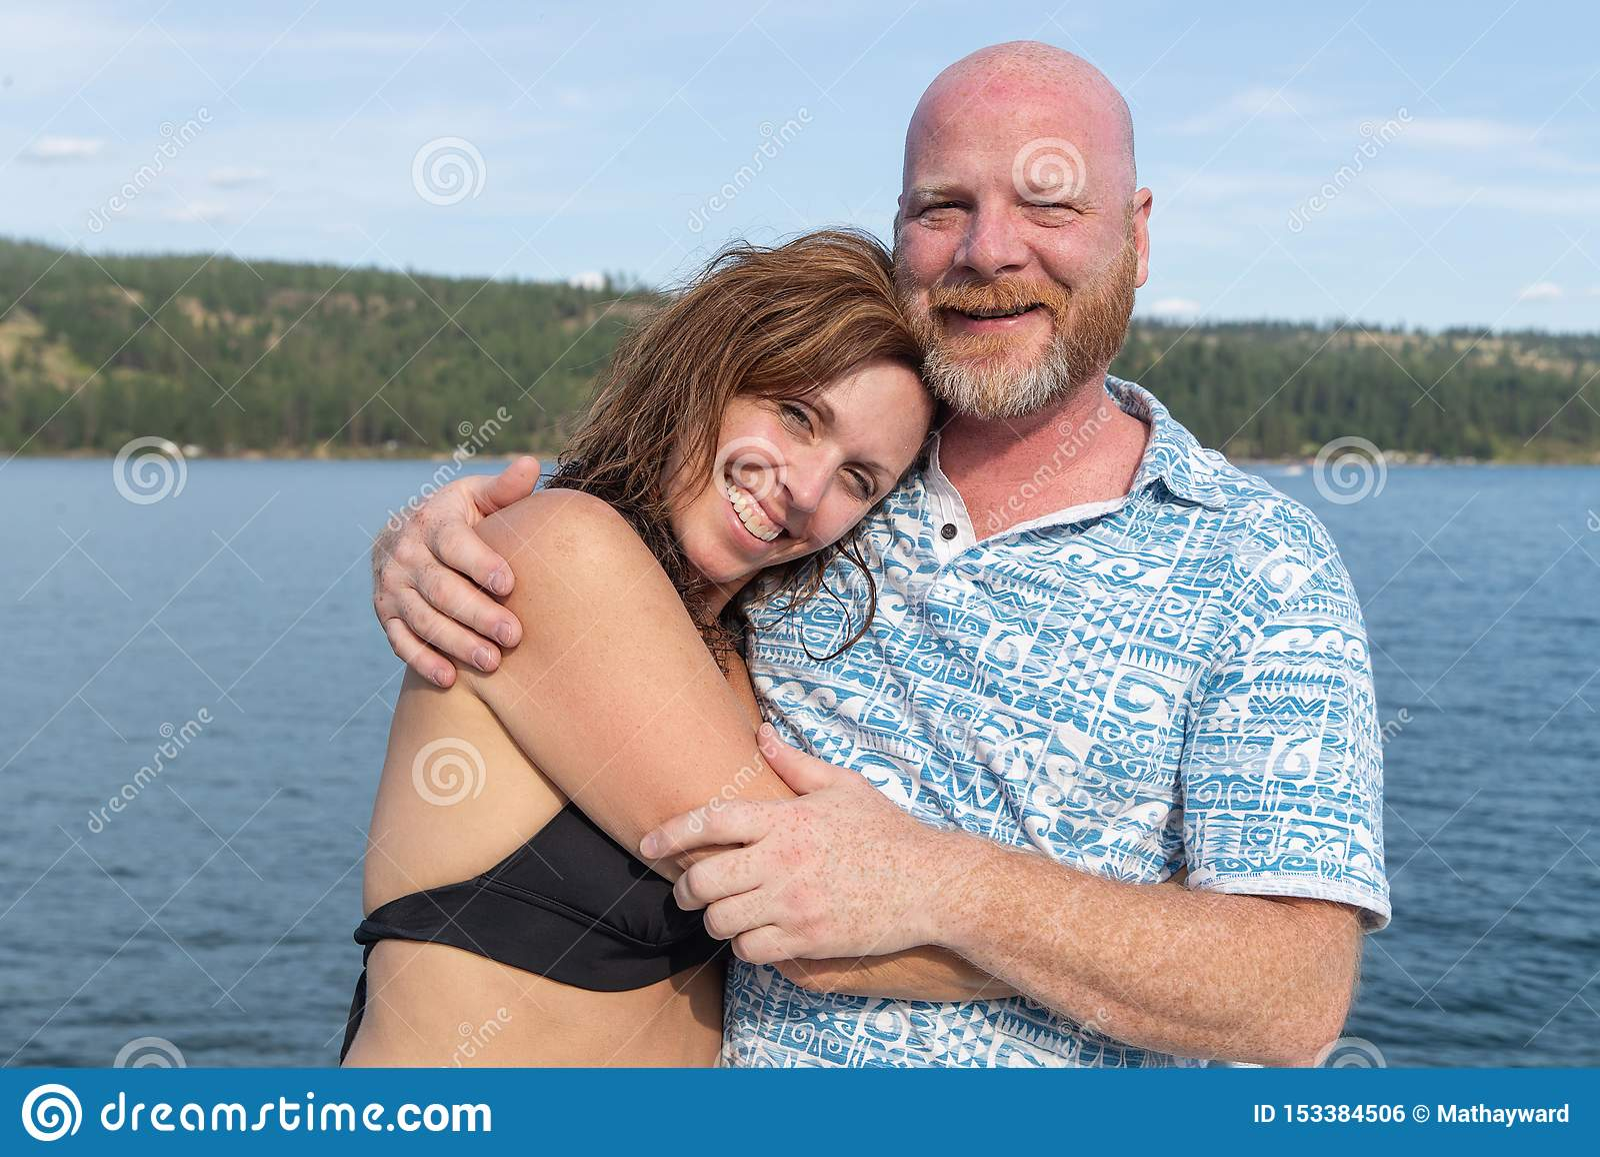 Happy Man and Woman together at a lake